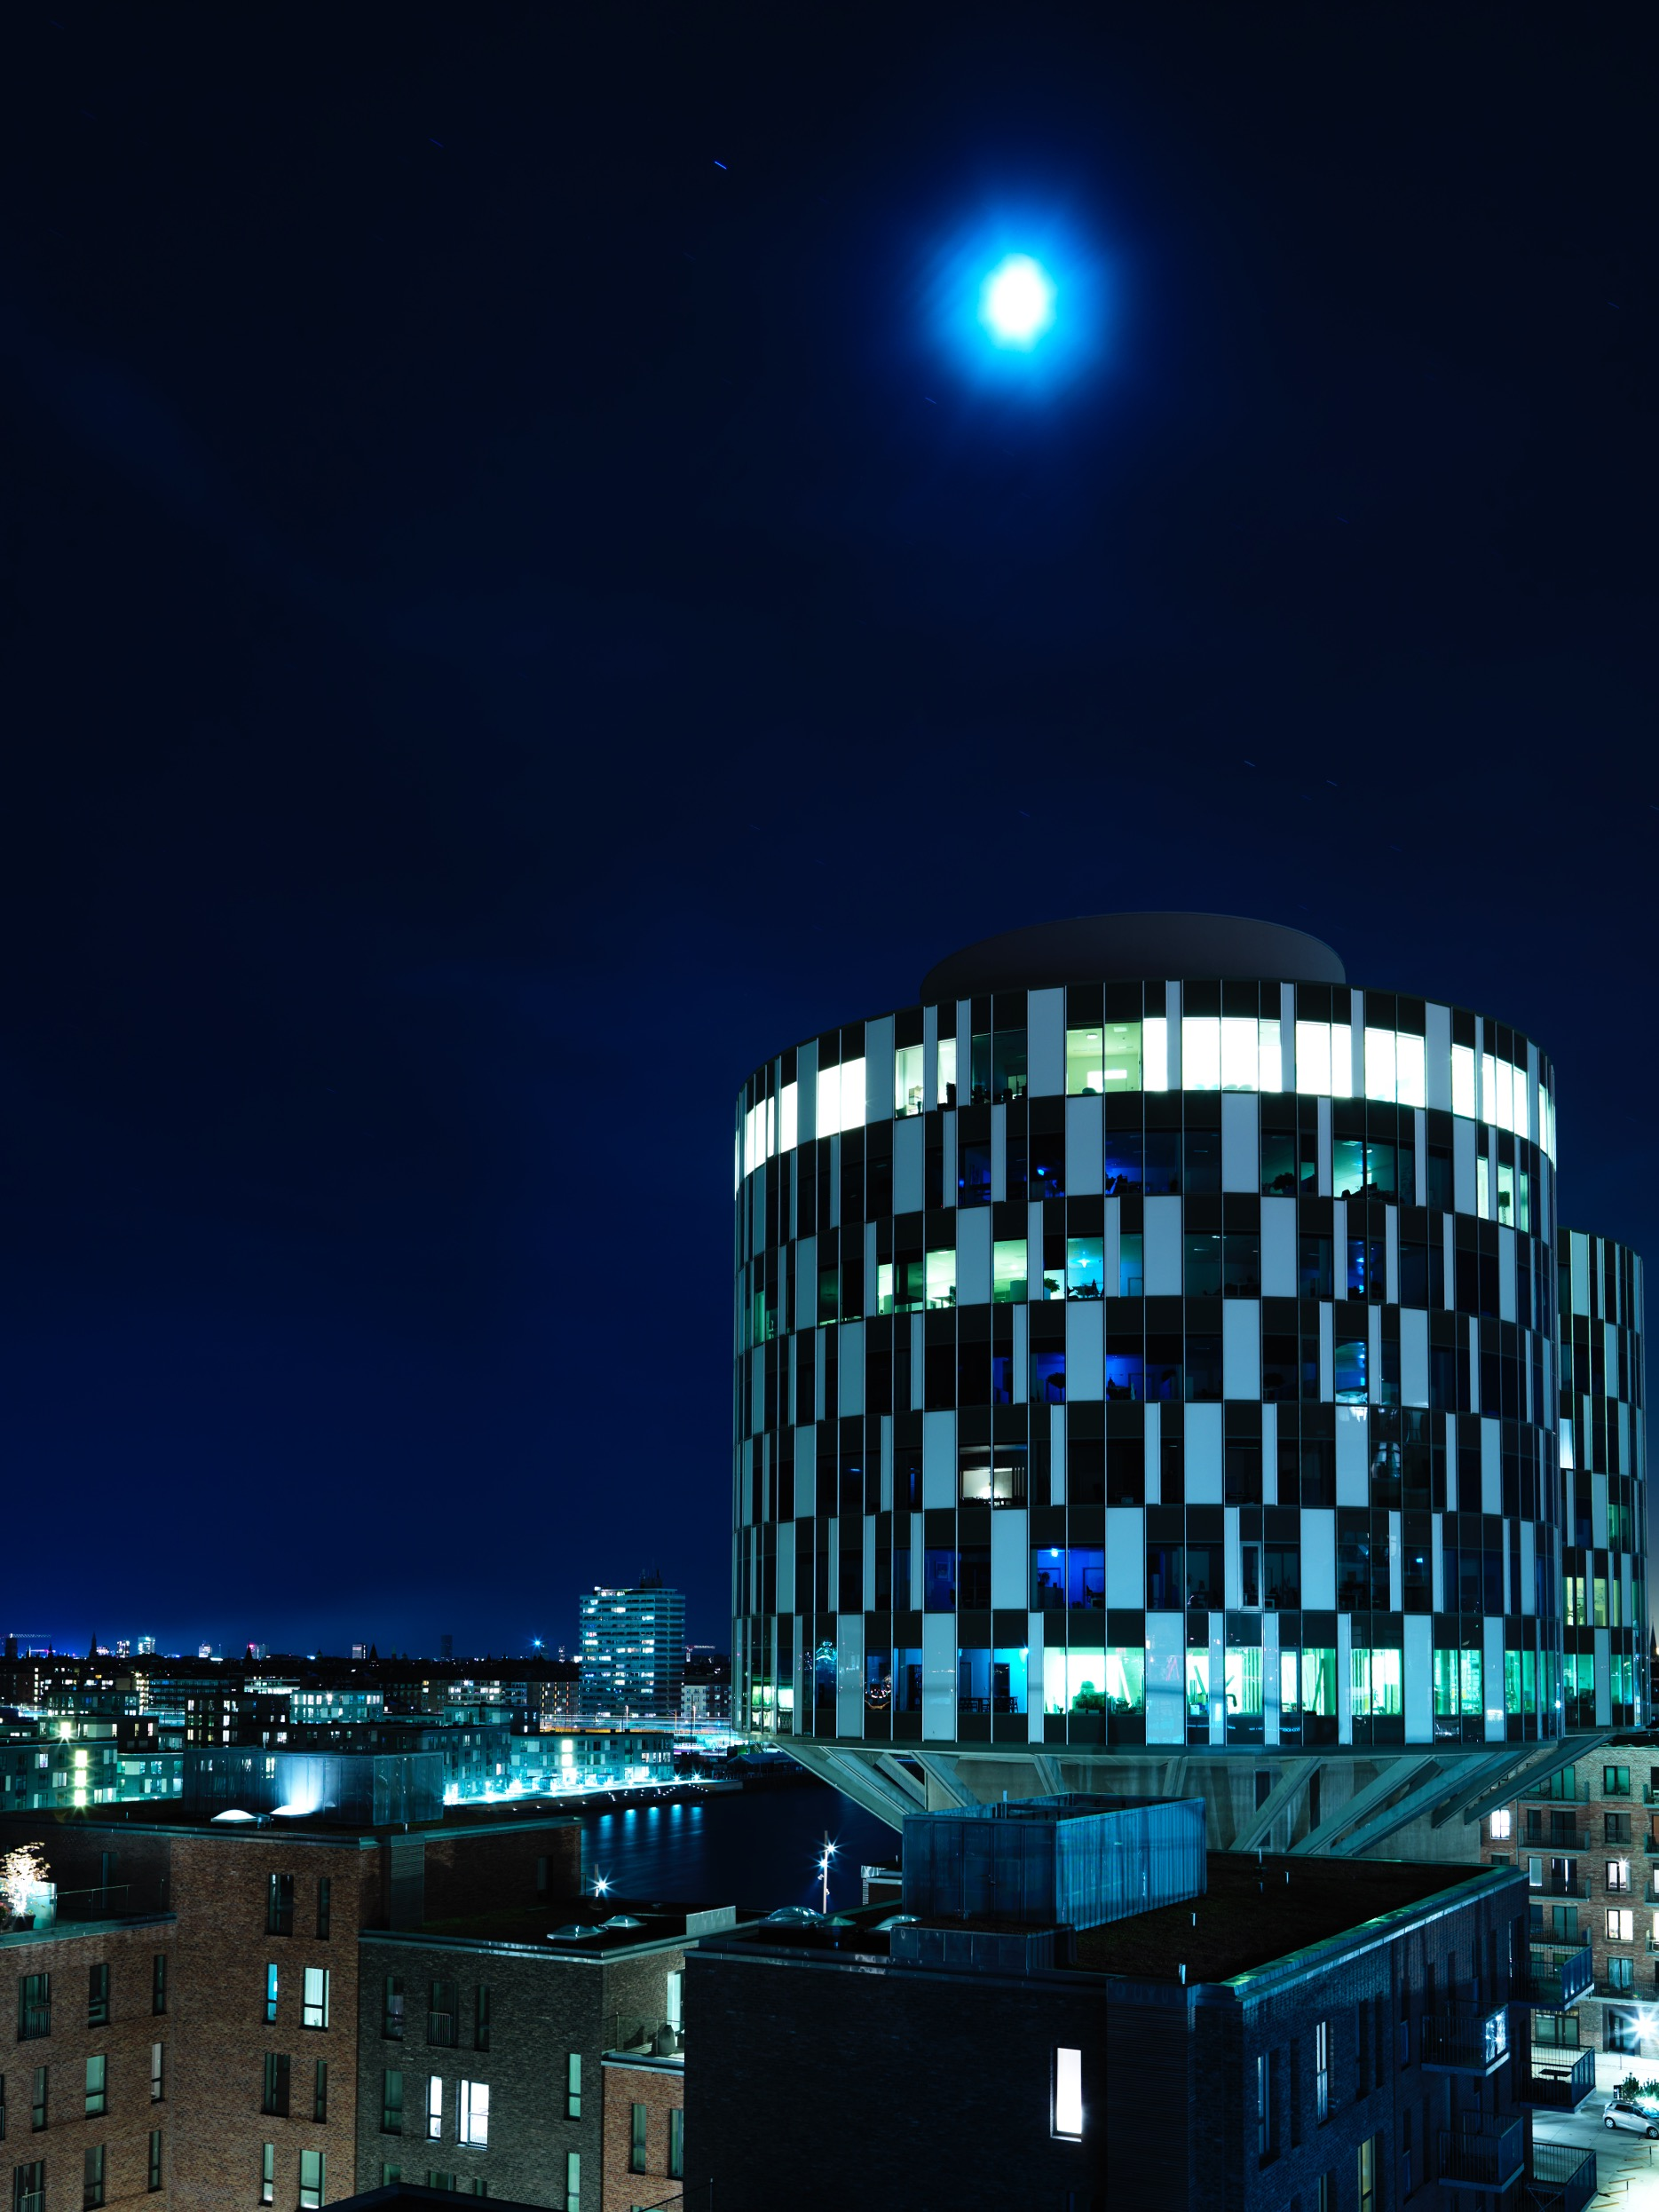 1721H Nordhavn by Night 0022.jpg